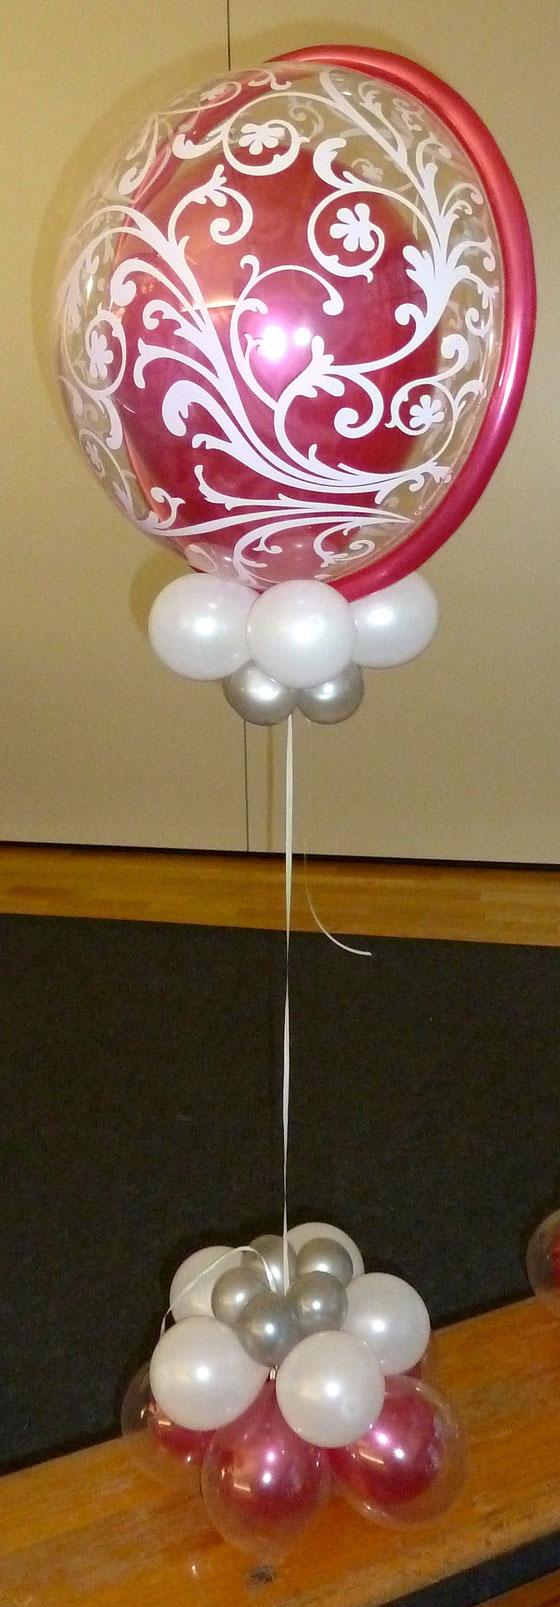 Mr.Balloni.ch,Deko,  Geburtstag, Überraschung, Tischdekoration,Firma, Betrieb, Feier, Jubiläum, Helium, Heliumballons